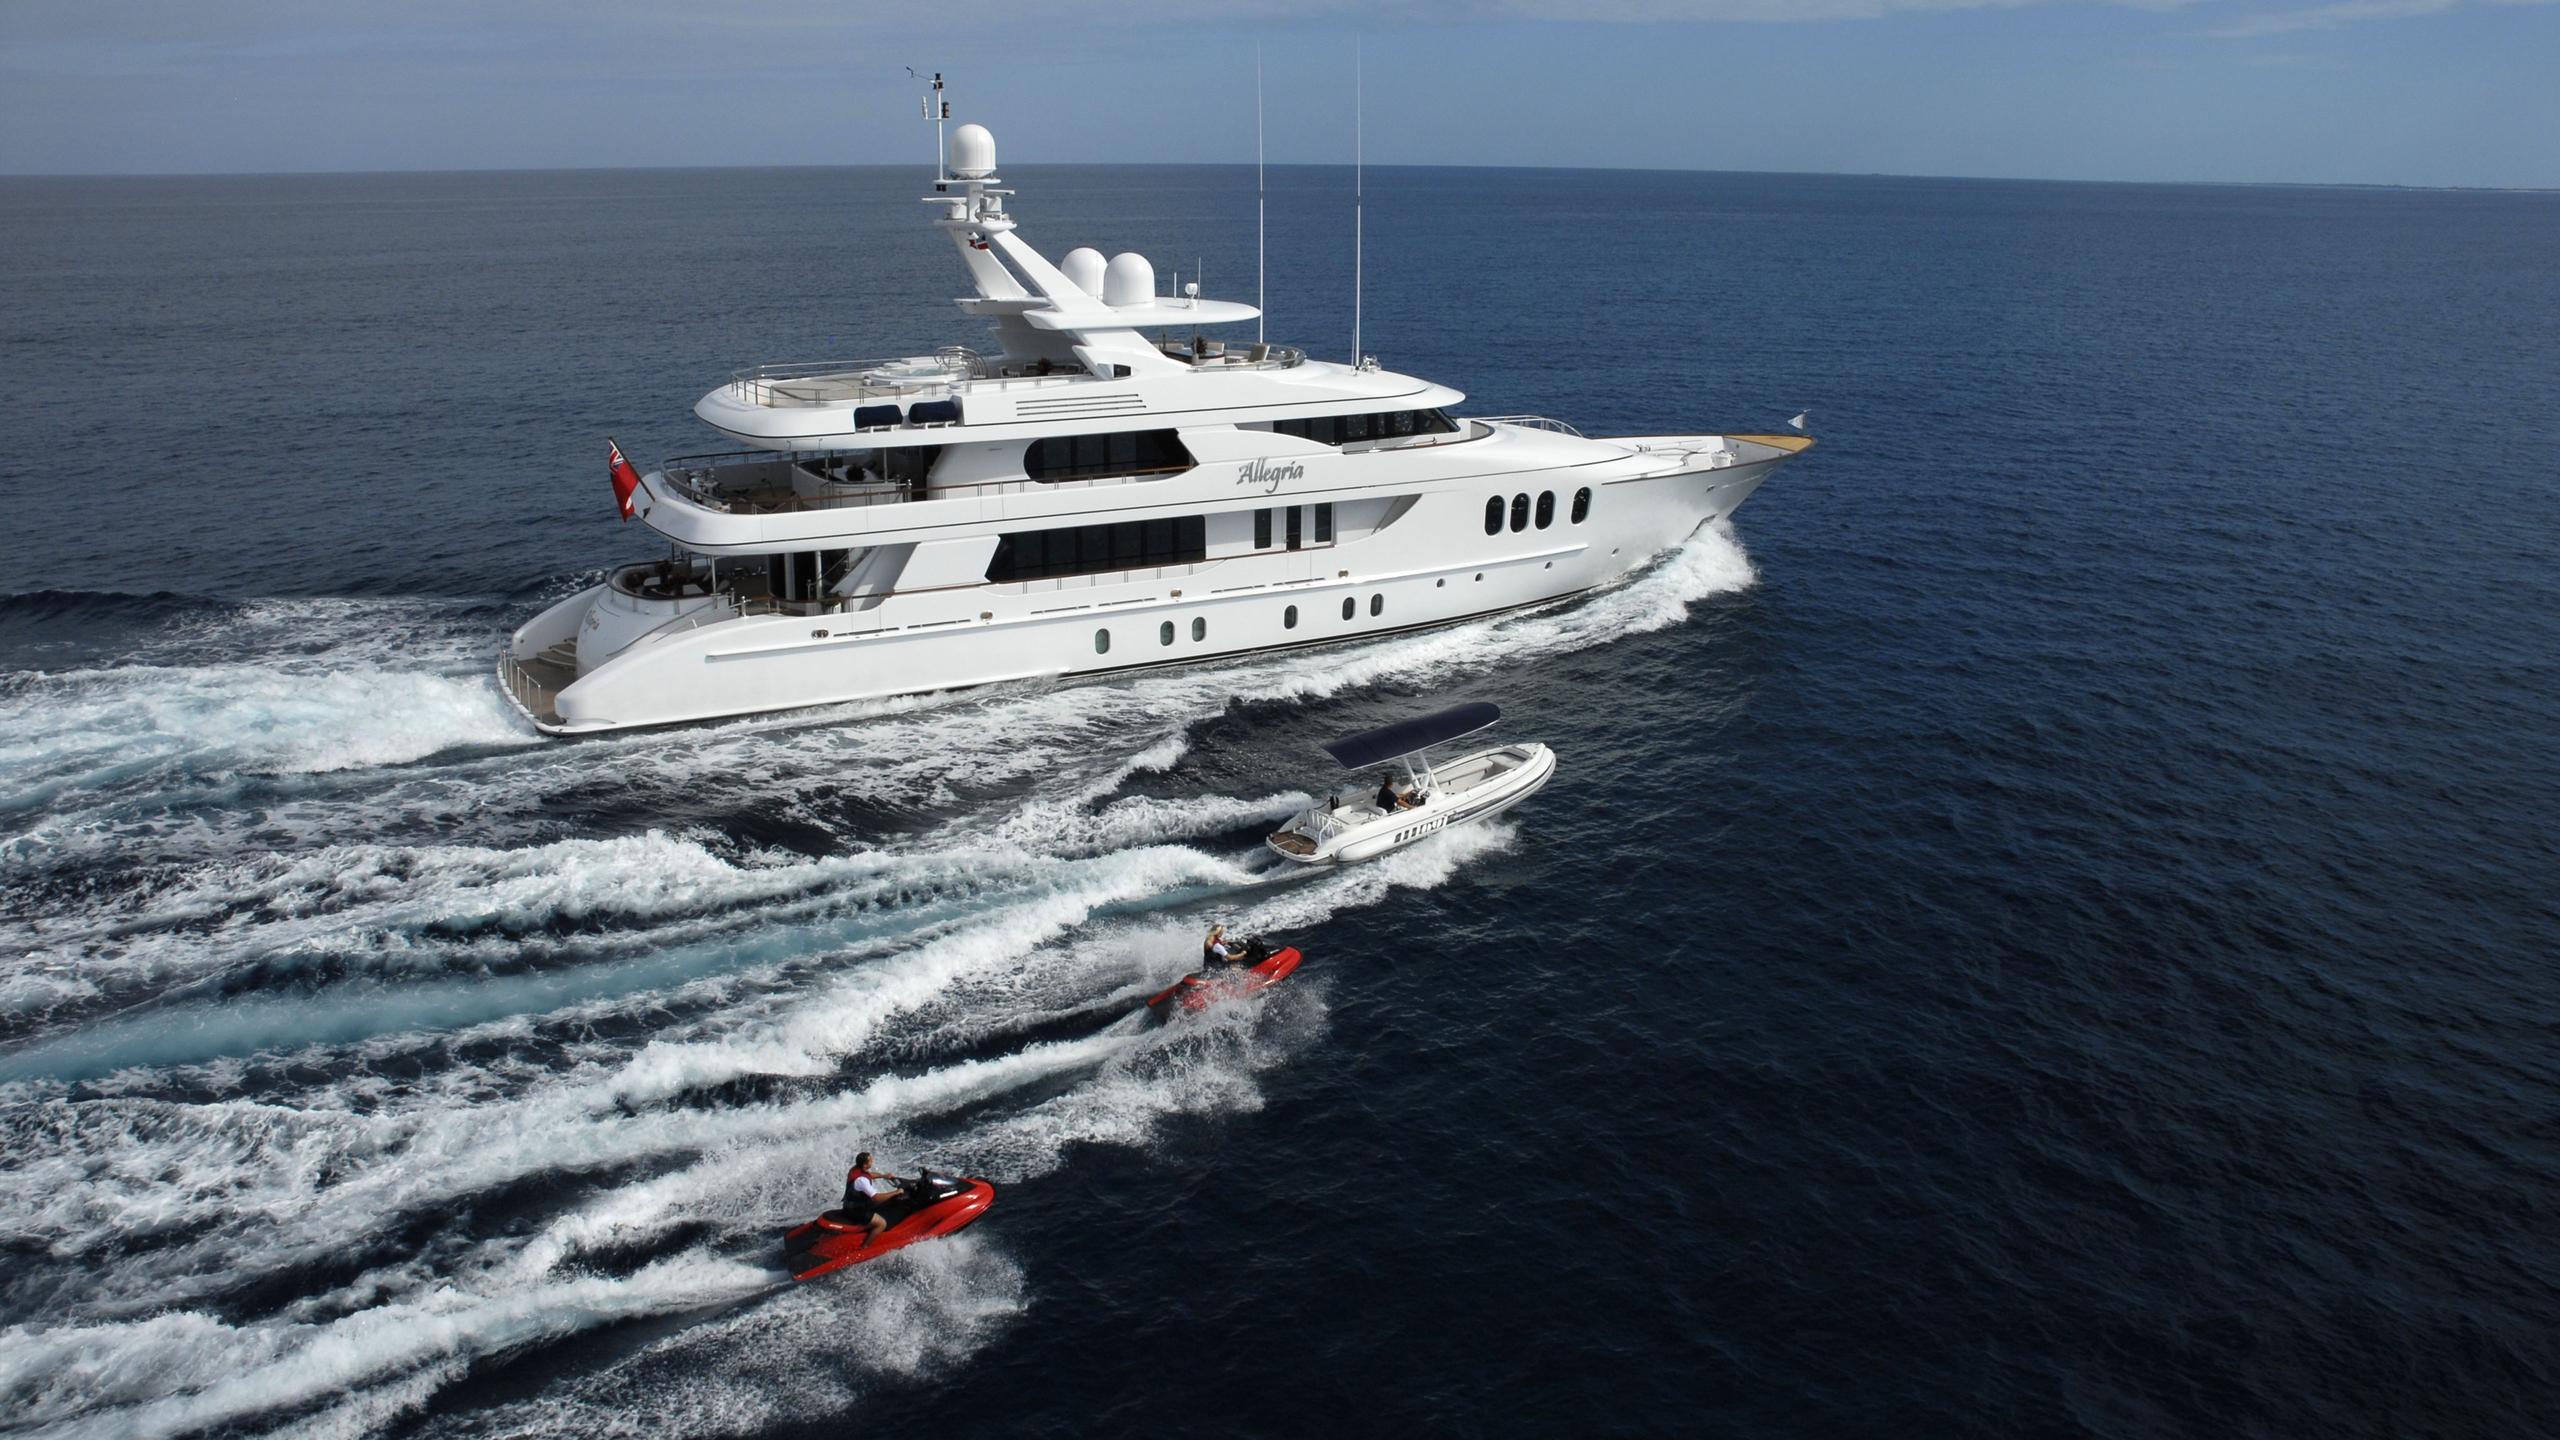 allegria-yacht-cruising-toys